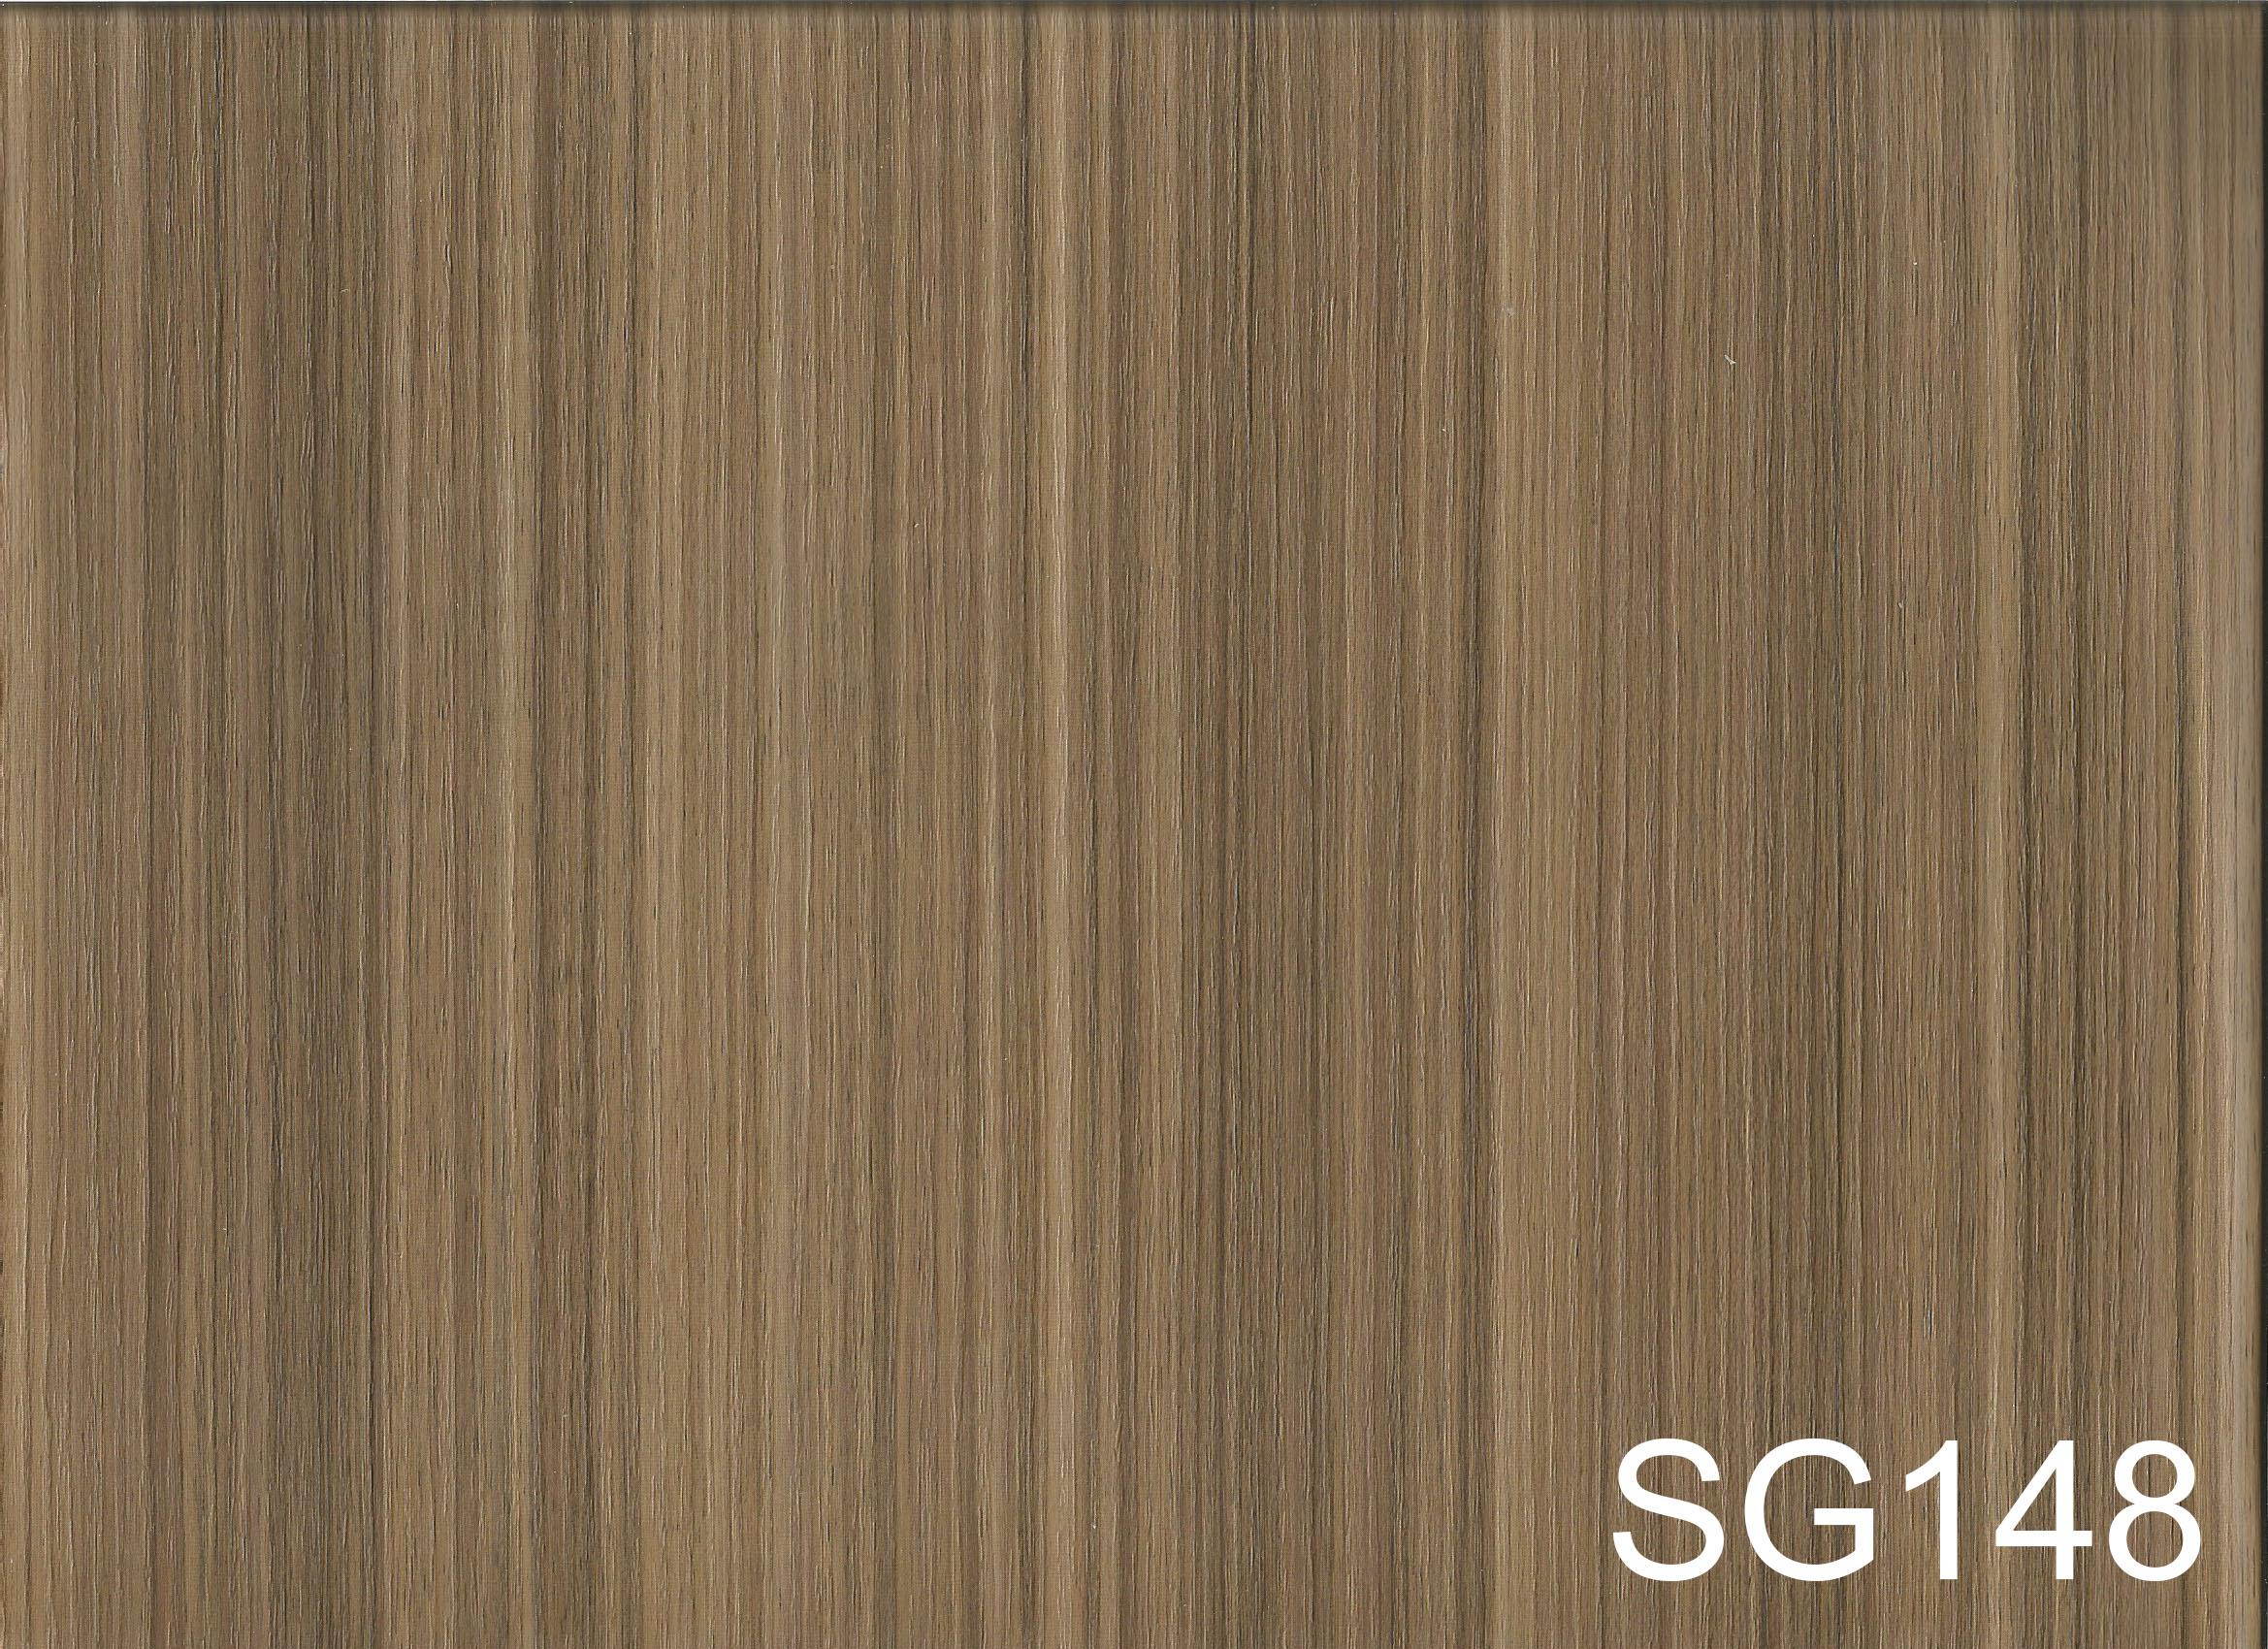 SG148